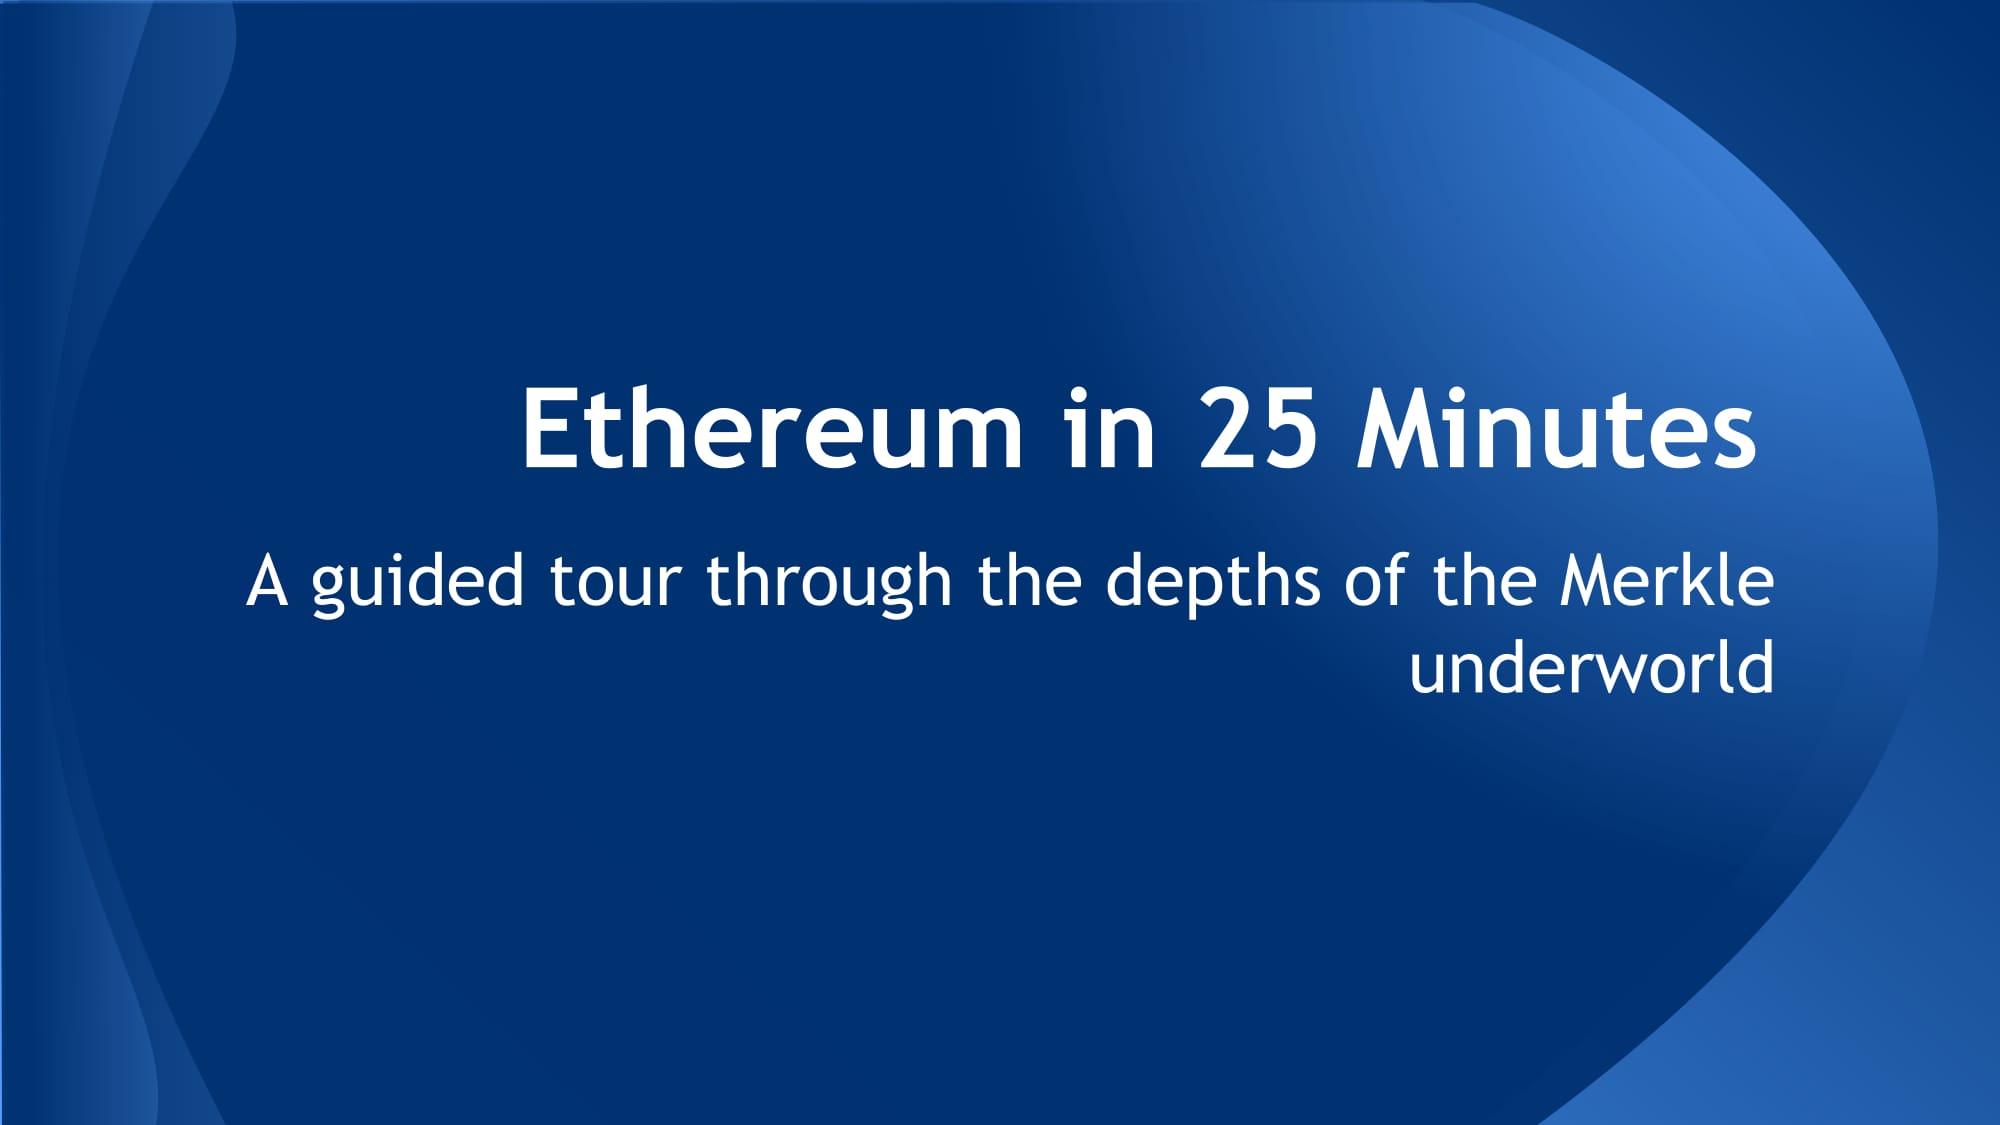 Ethereum in 25 Minutes-01.jpg